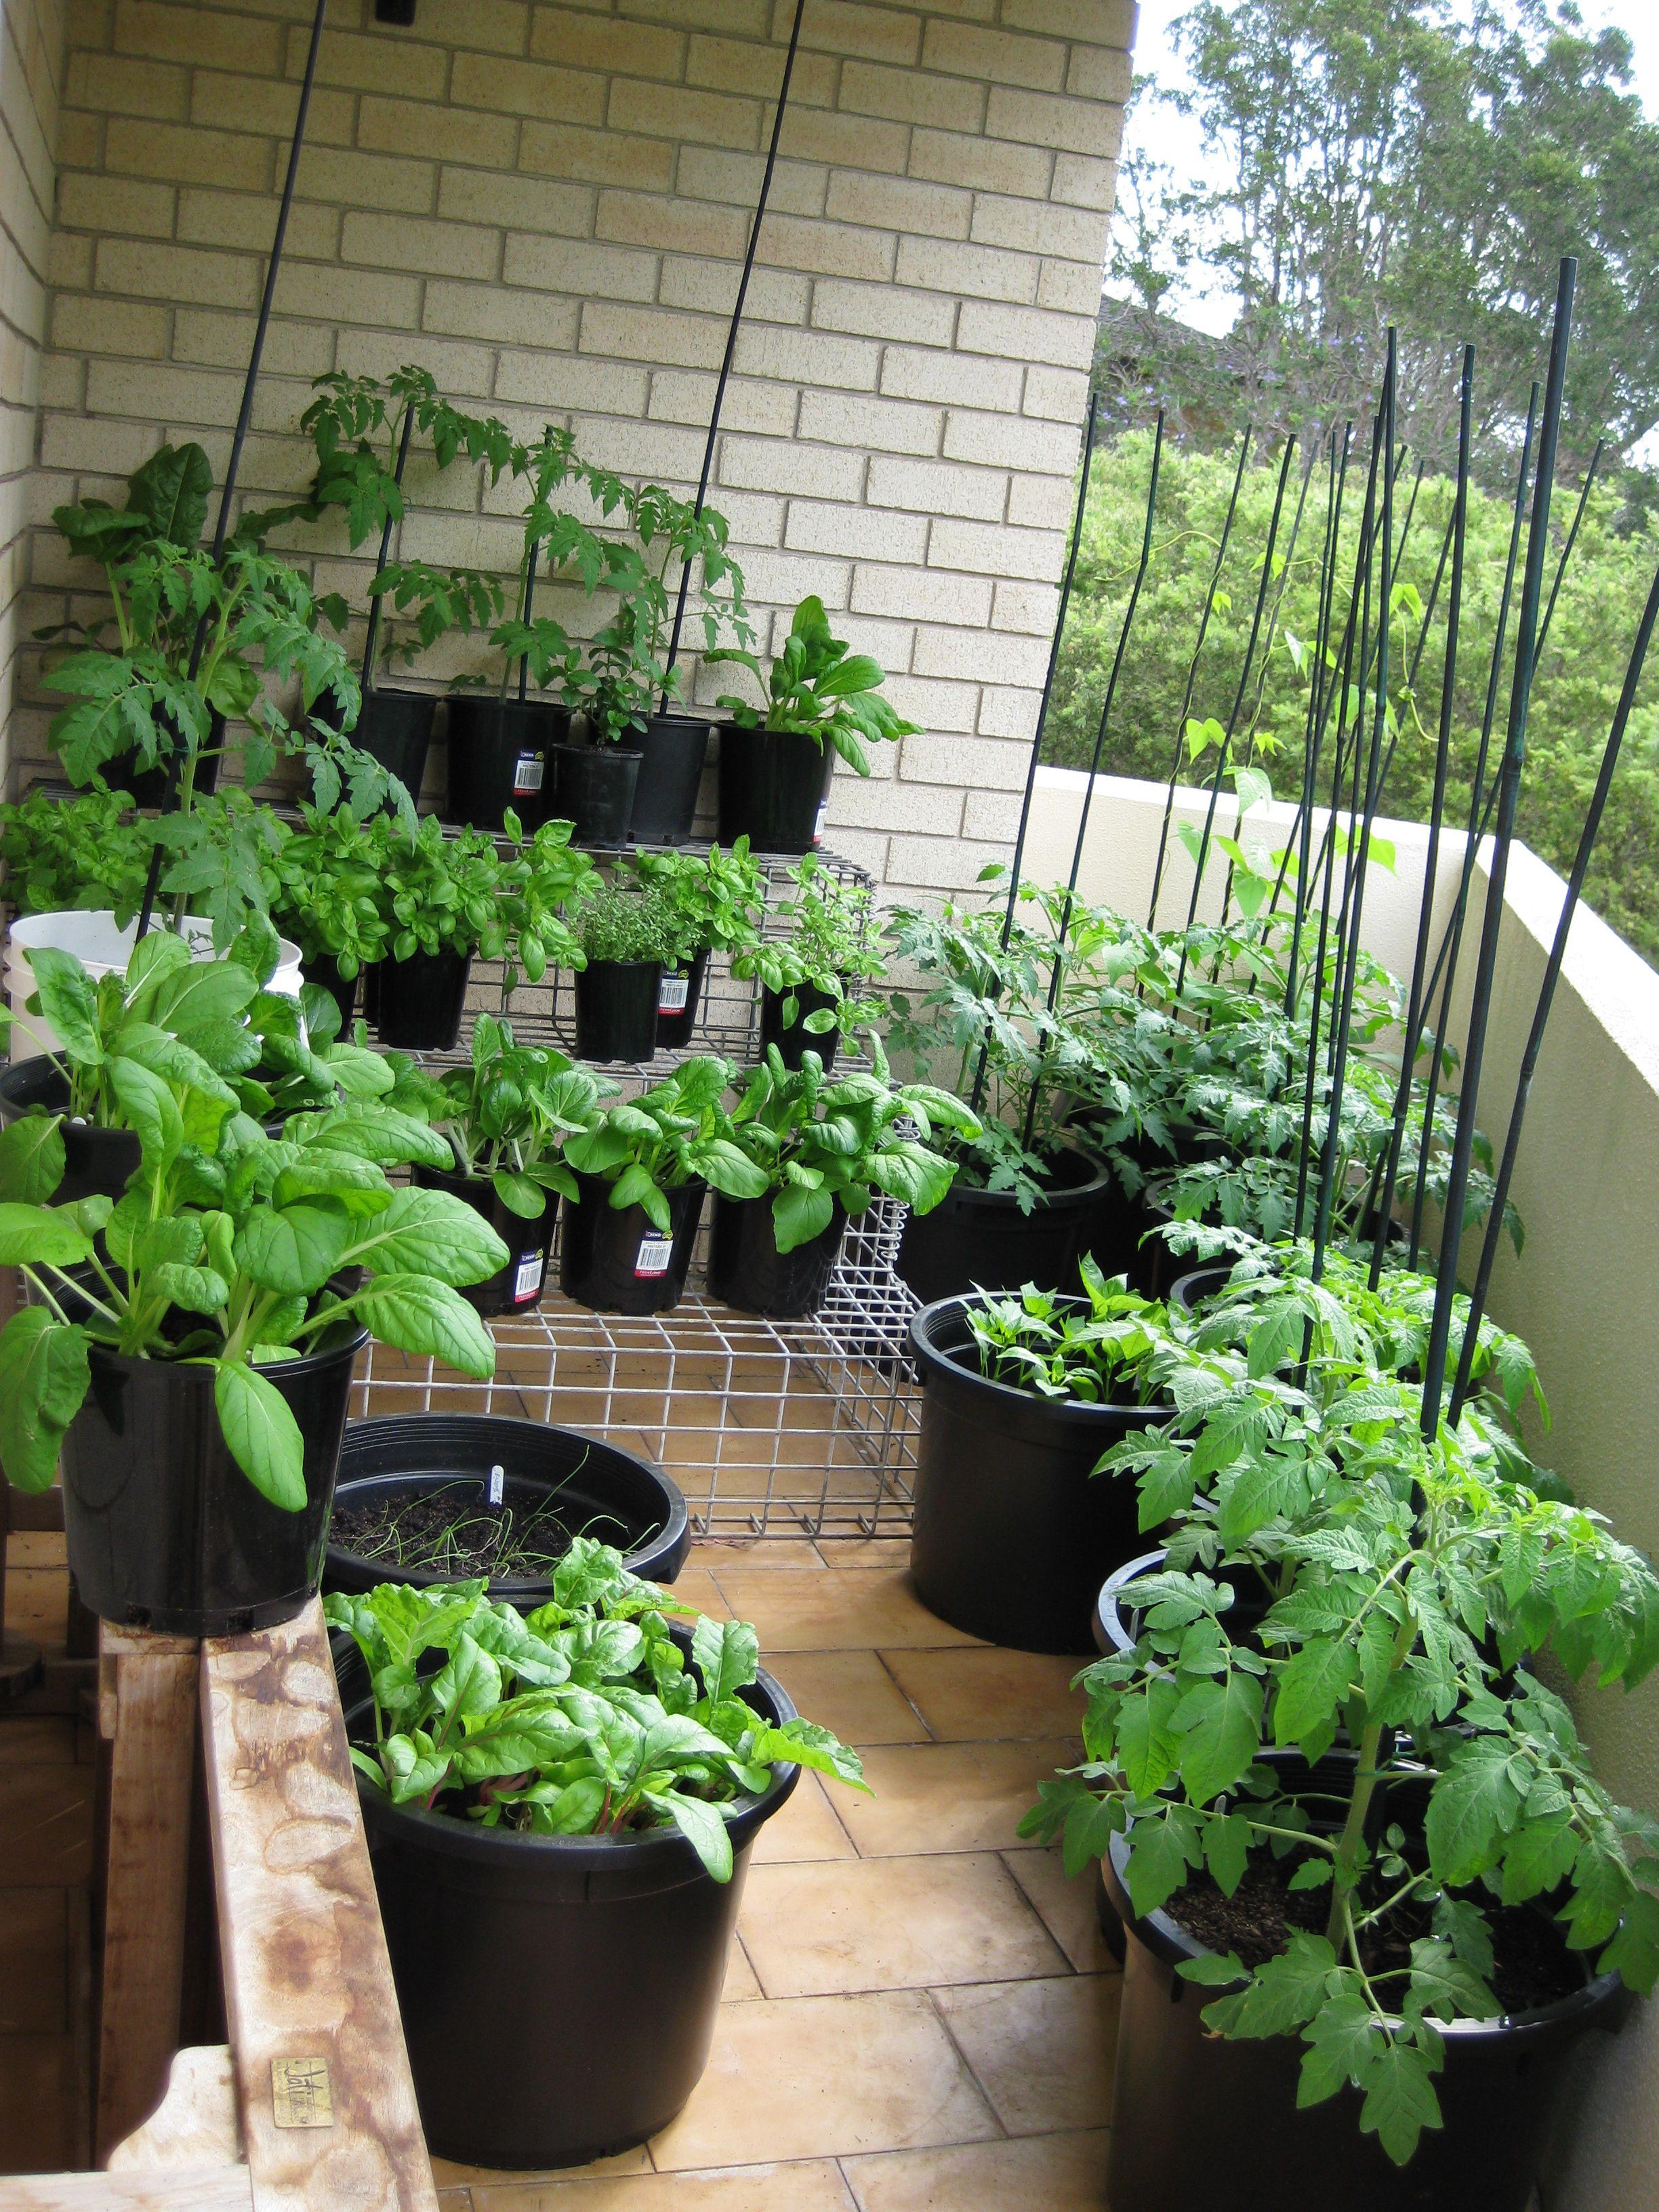 17 Inspiring Balcony Garden Australia That Will Make